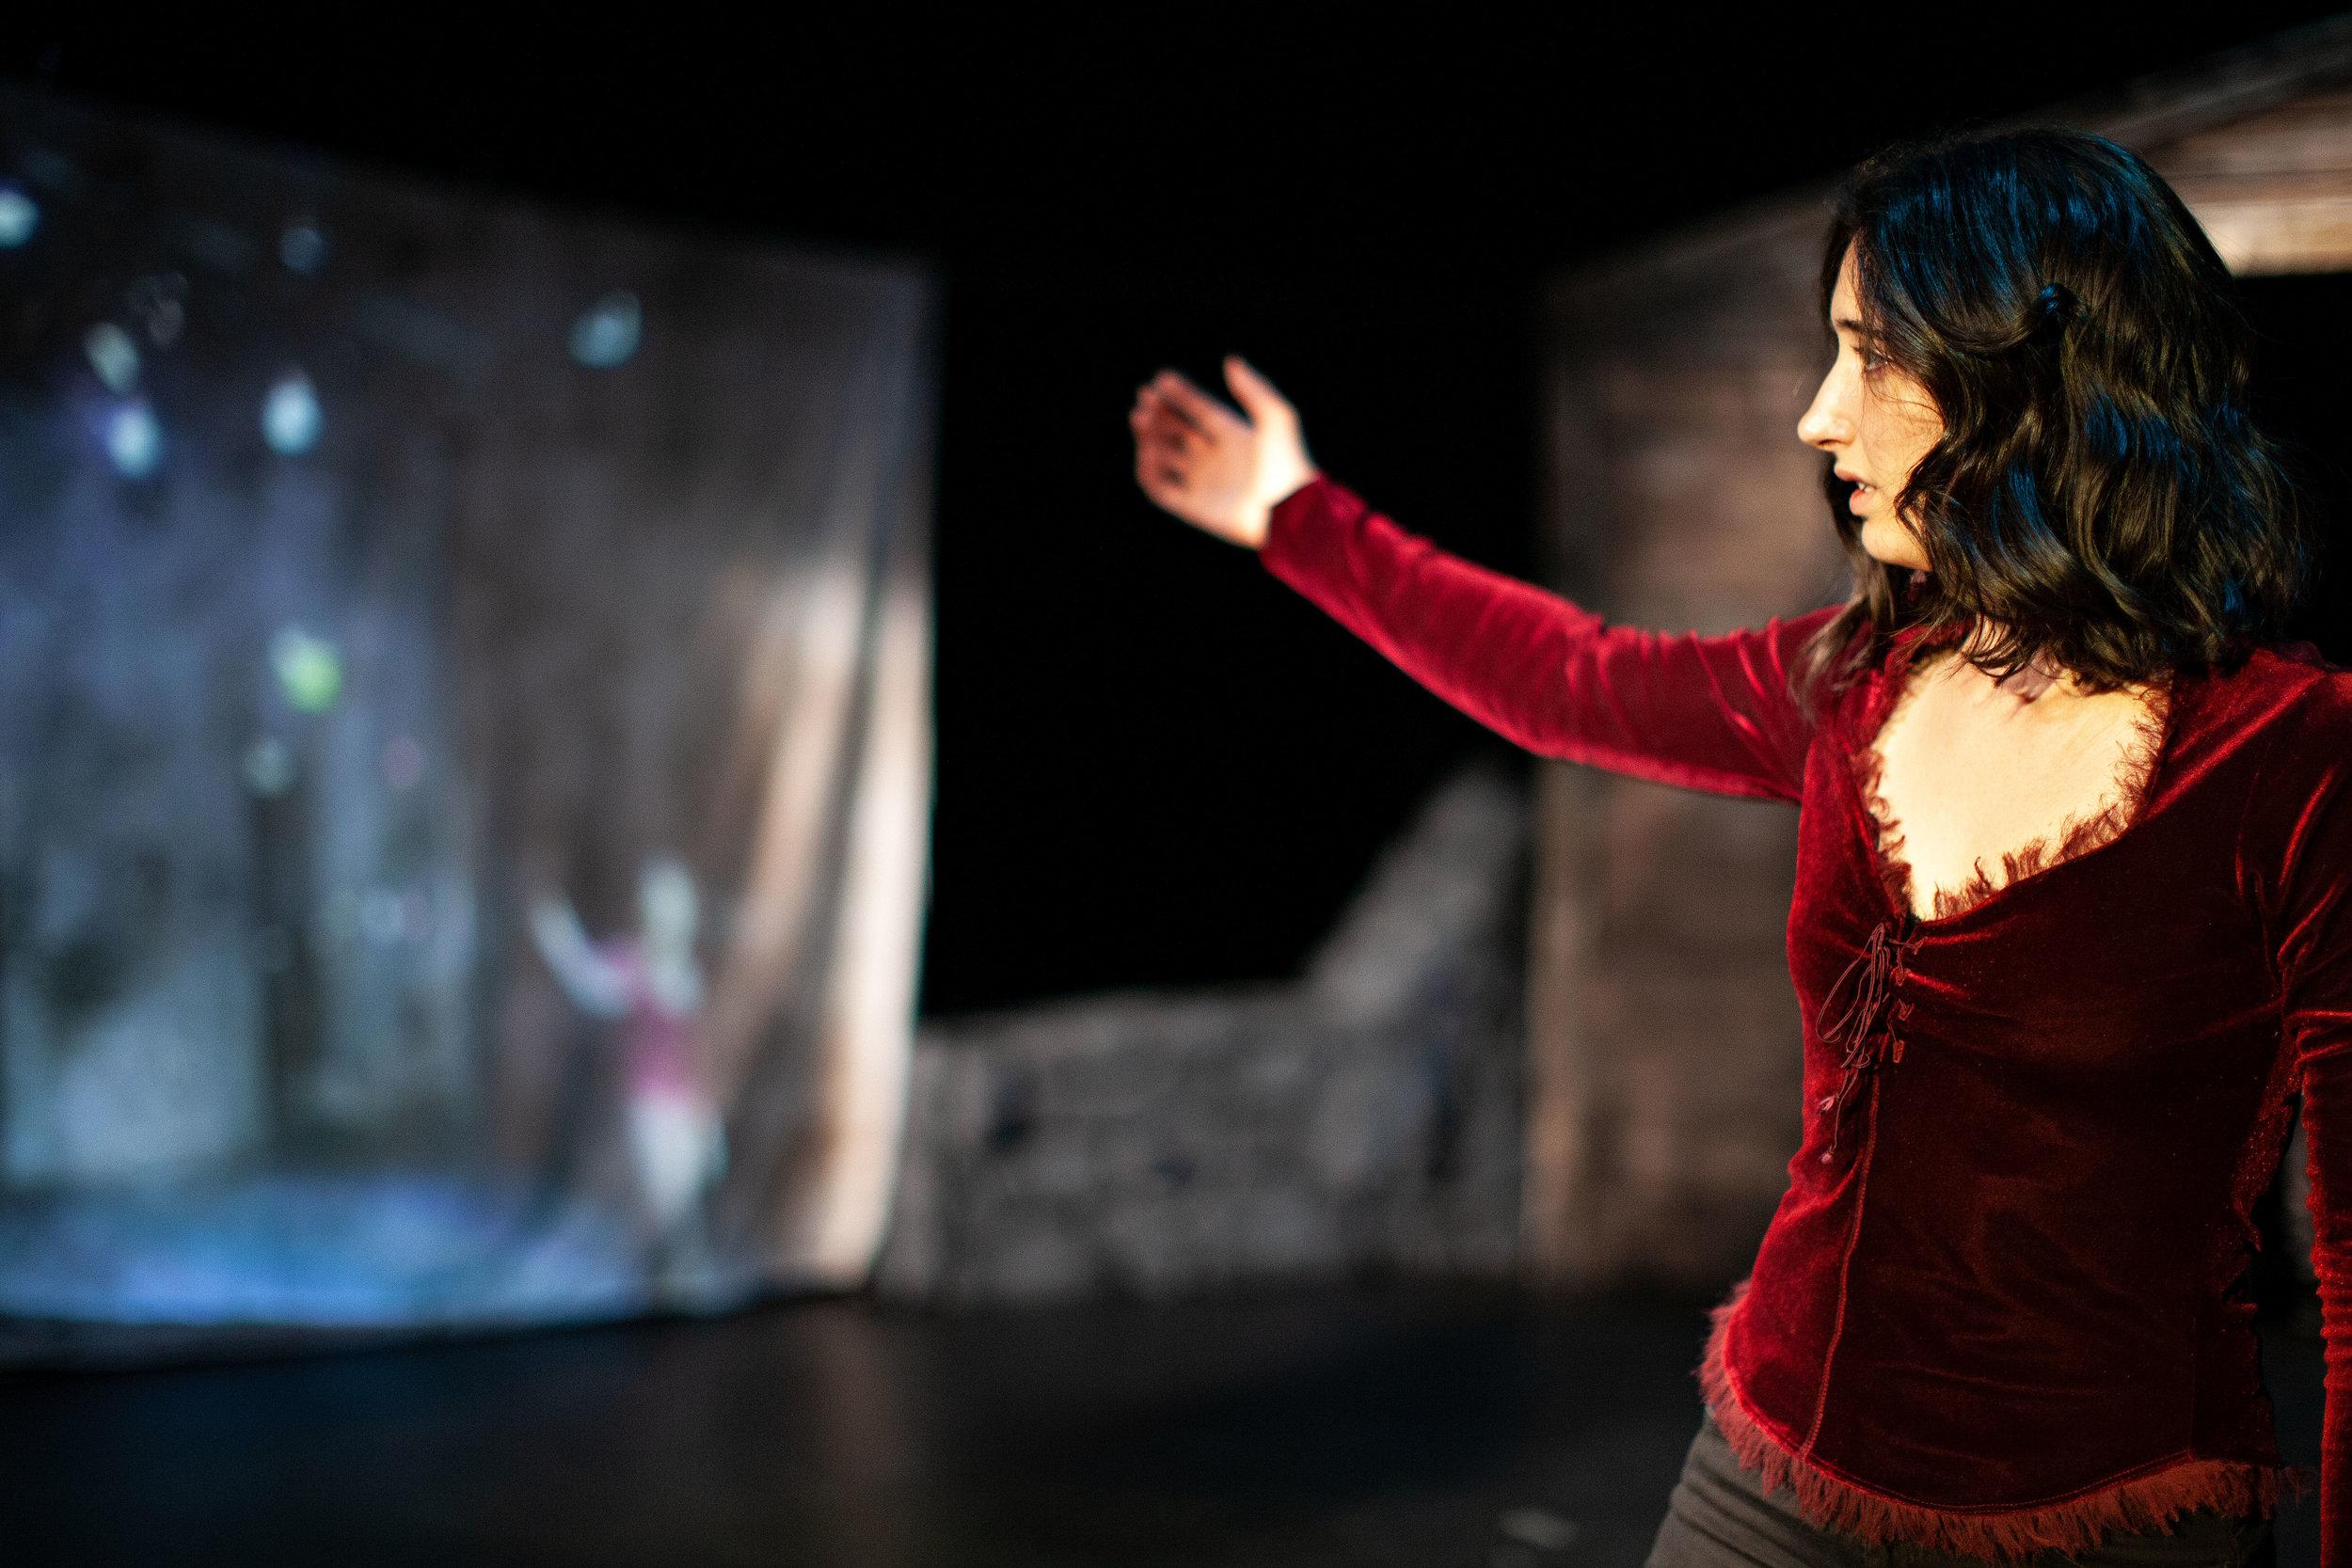 Lady Macbeth Out Damned Spot 3.jpg